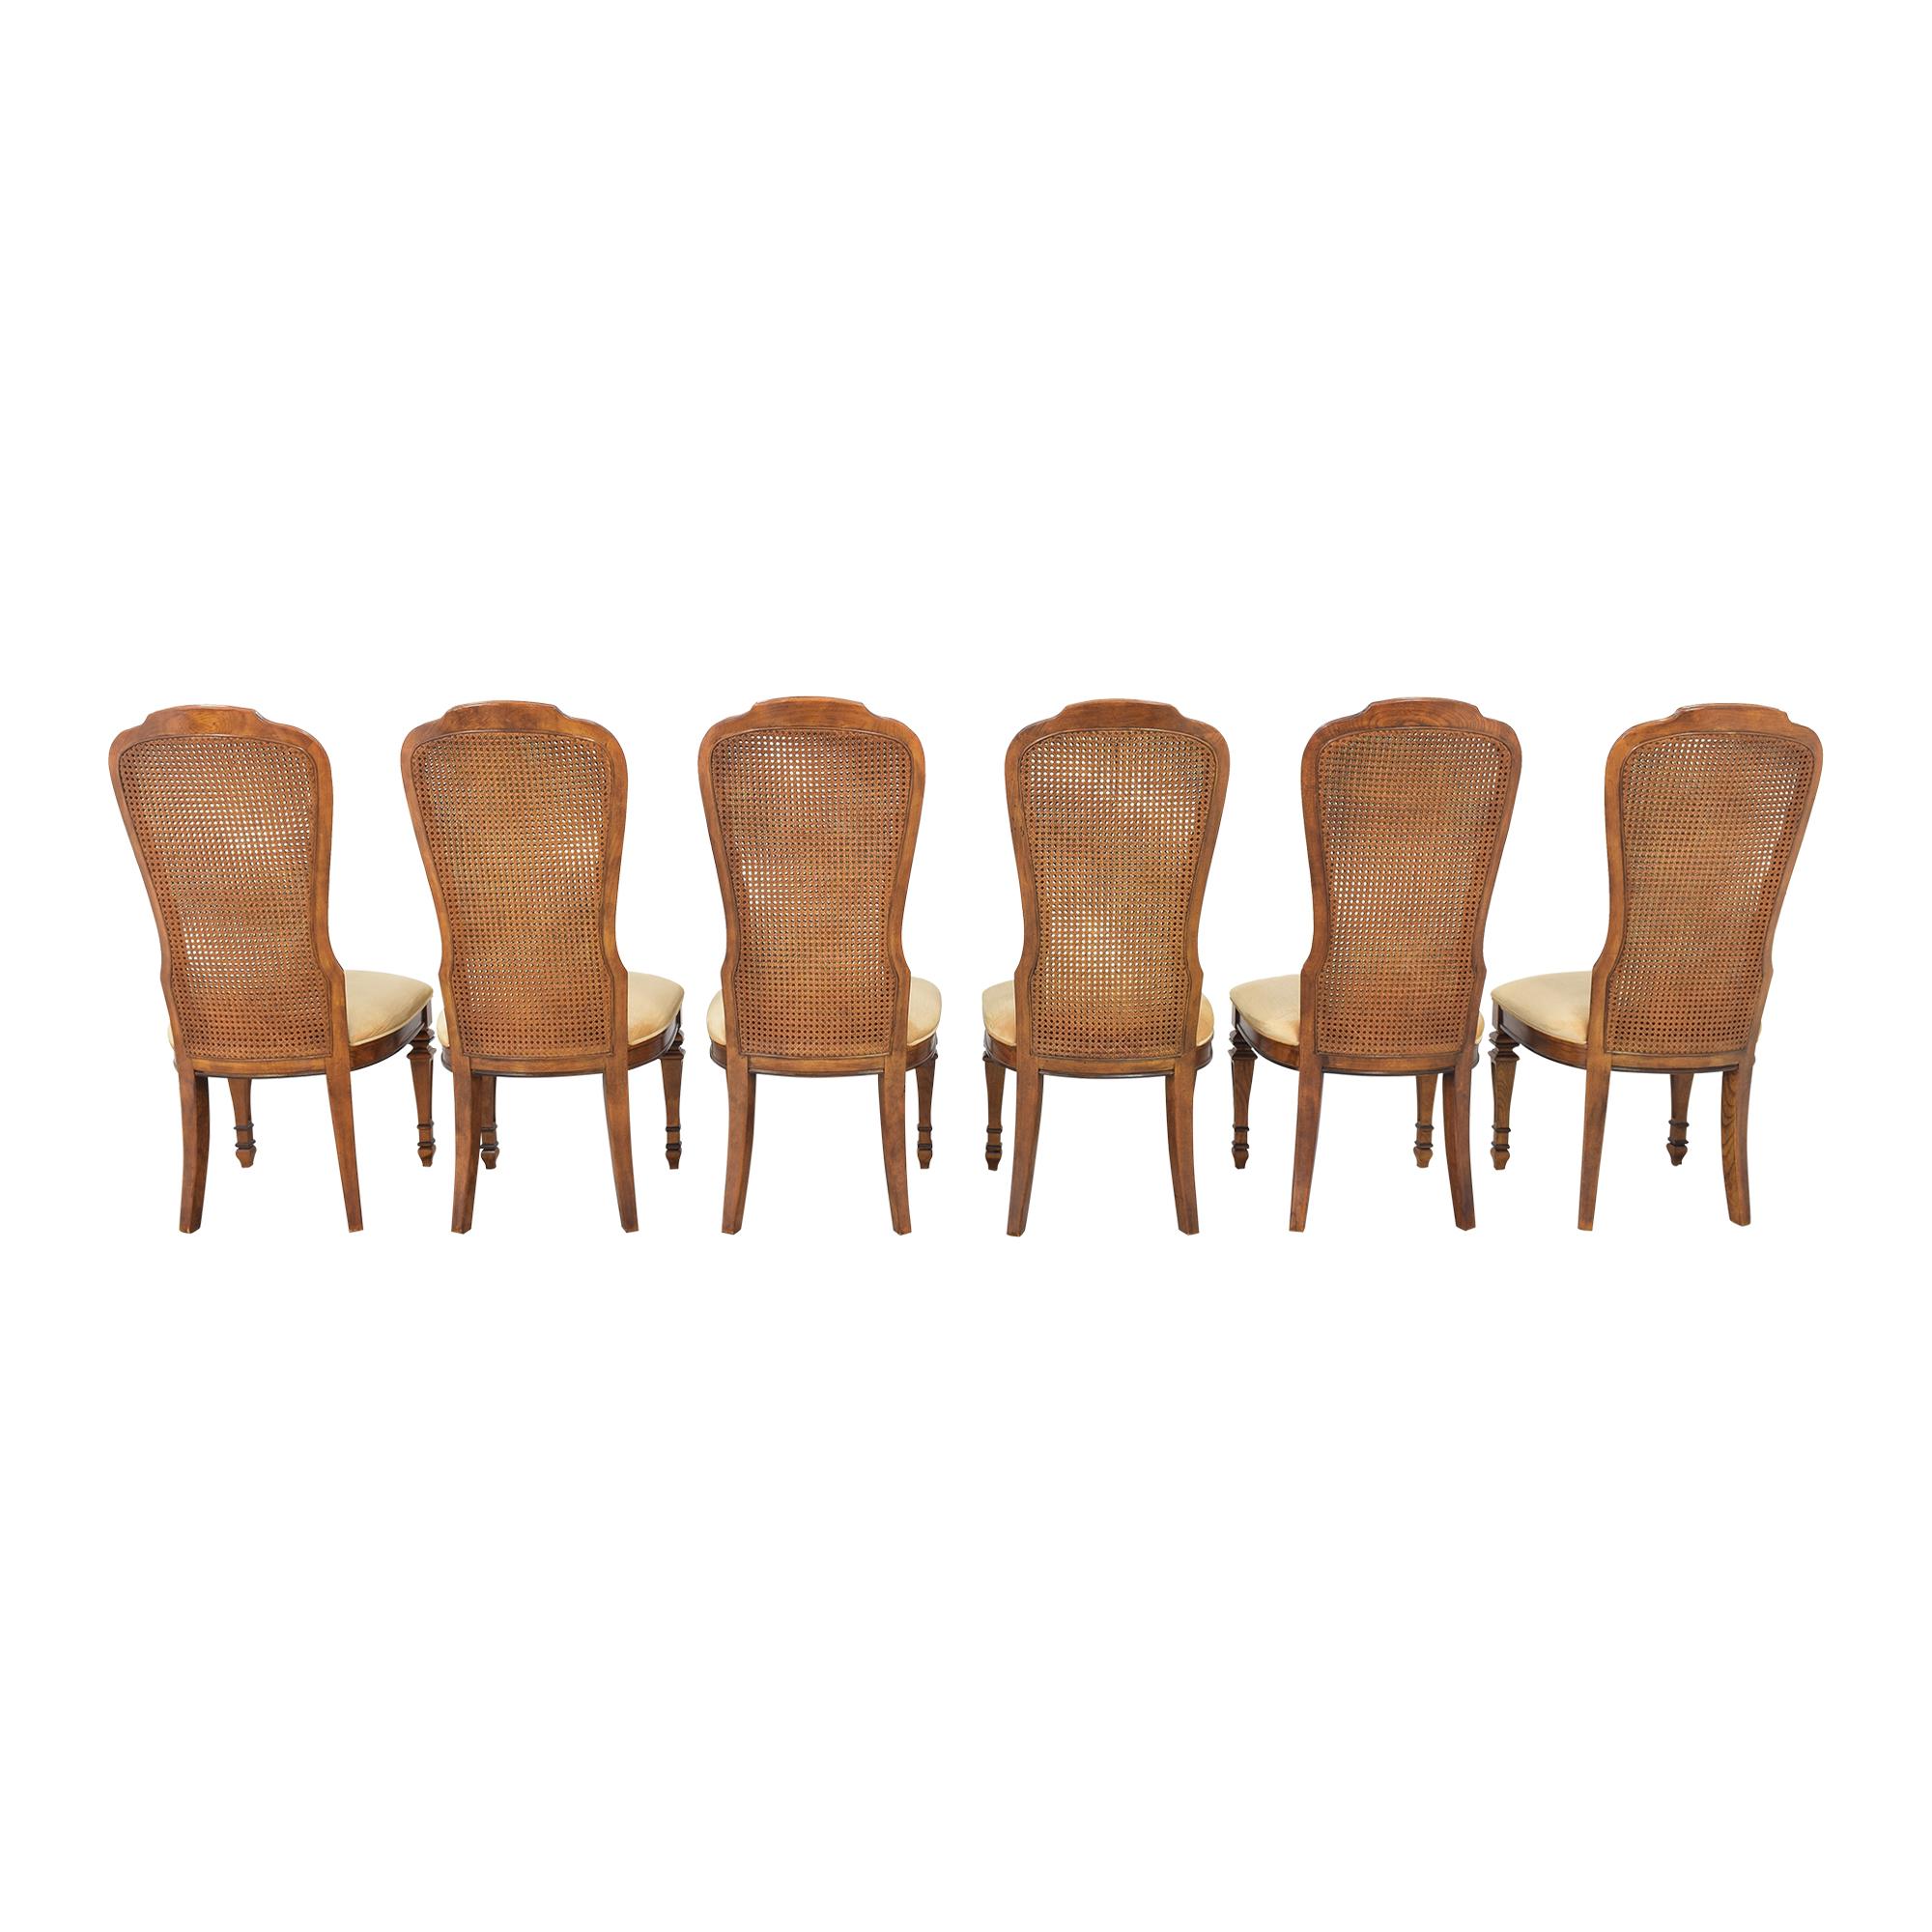 Bernhardt Bernhardt Upholstered Dining Chairs Chairs